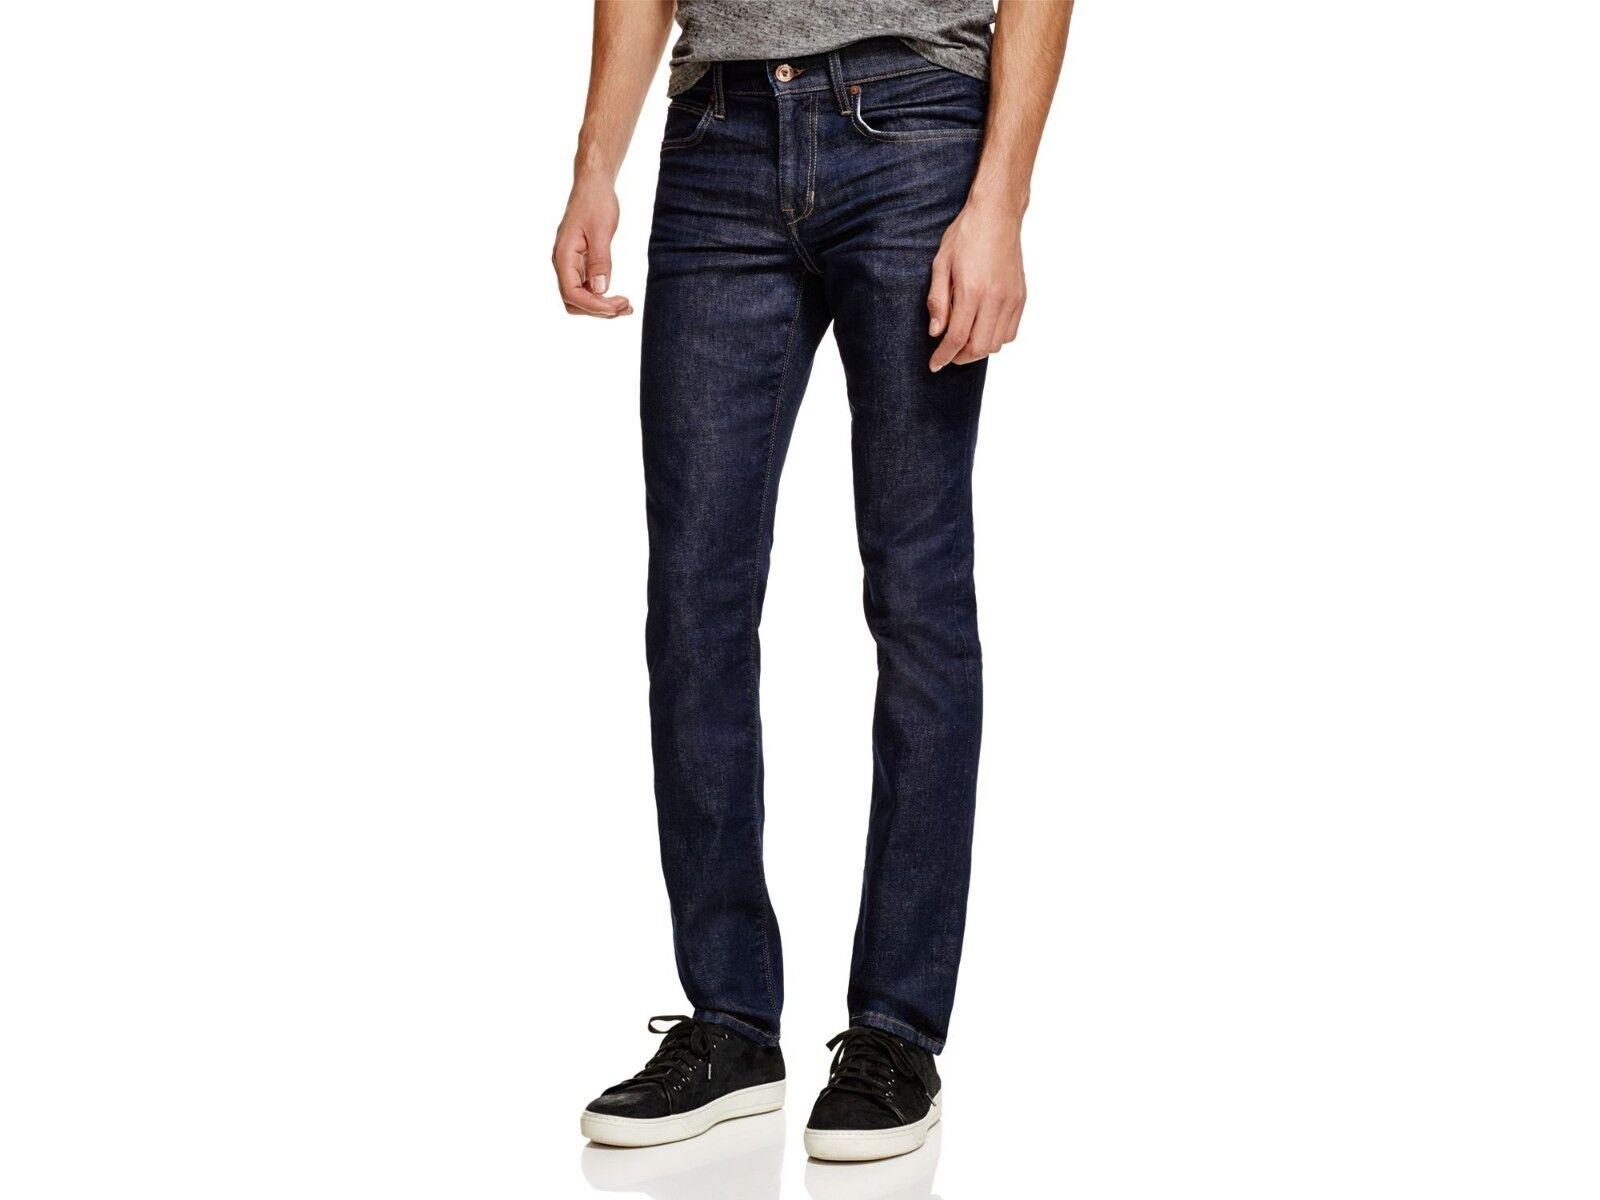 Joe's jeans, the classic straight leg, asher, dark bluee wash, new, men's w33